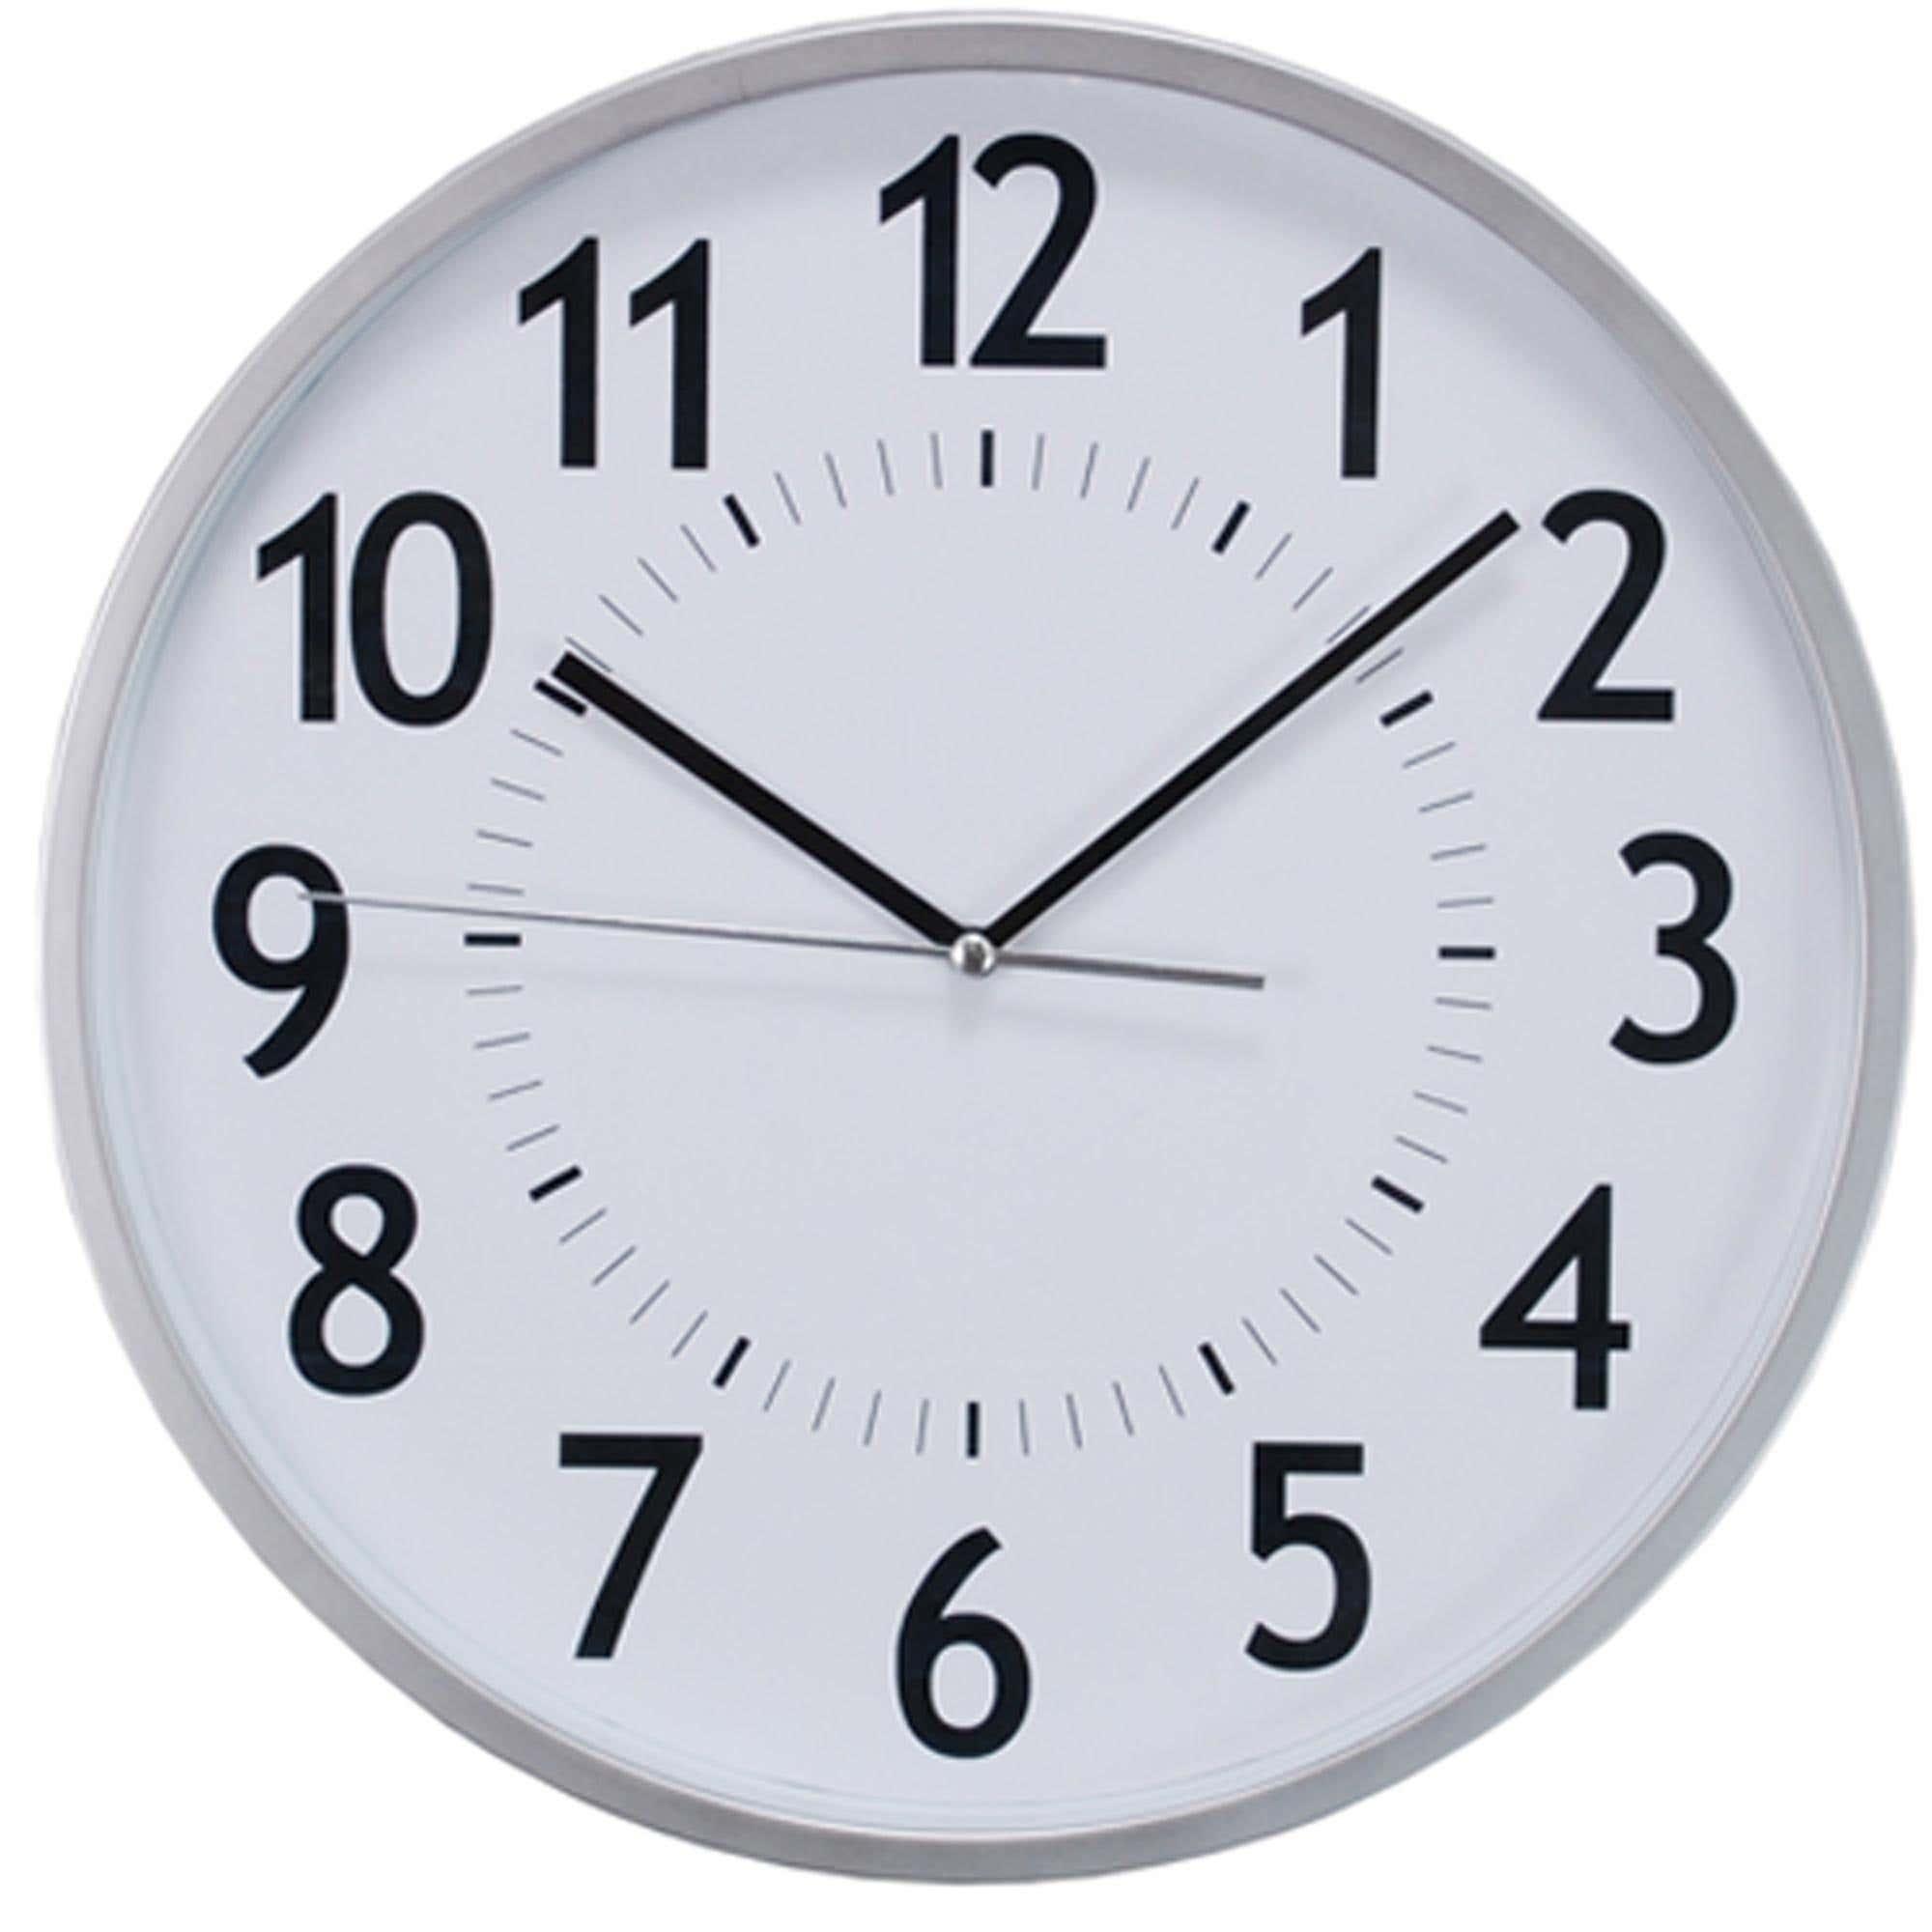 Kiera Grace Synchro Wall Clock Silver Kitchen Stuff Plus